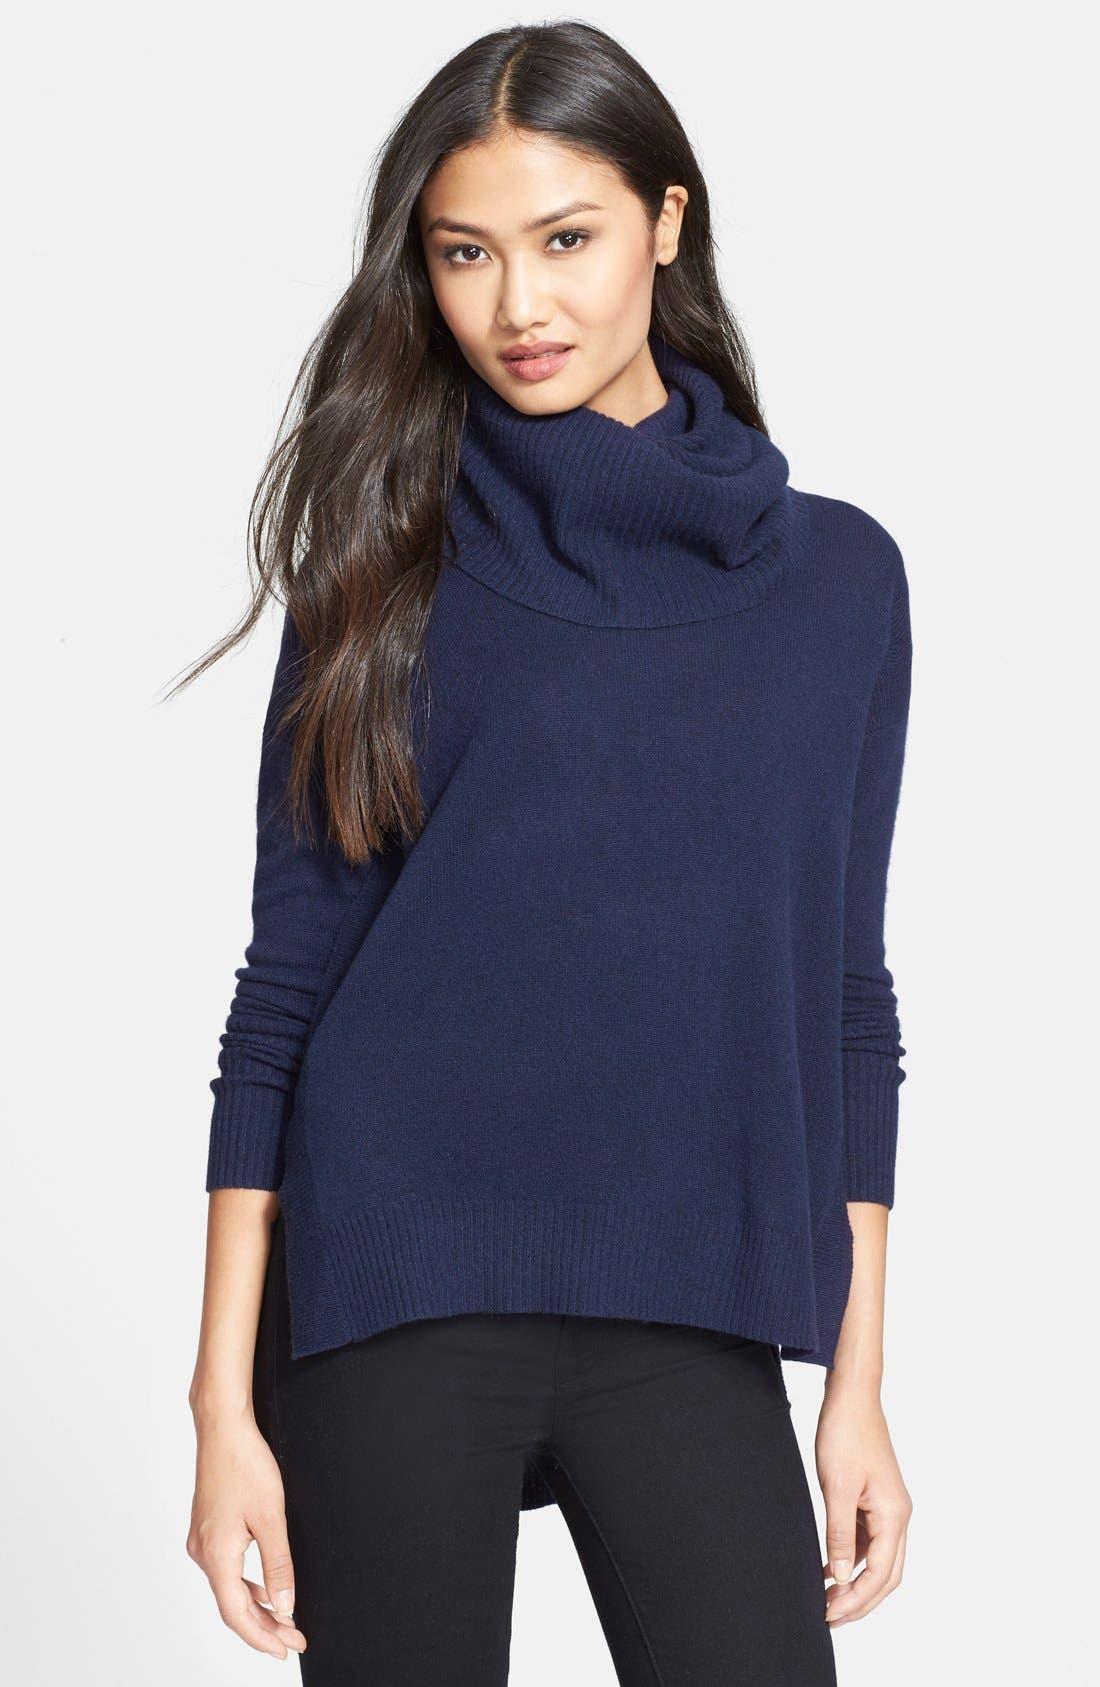 Alternate Image 1 Selected - Diane von Furstenberg 'Ahiga' Turtleneck Sweater